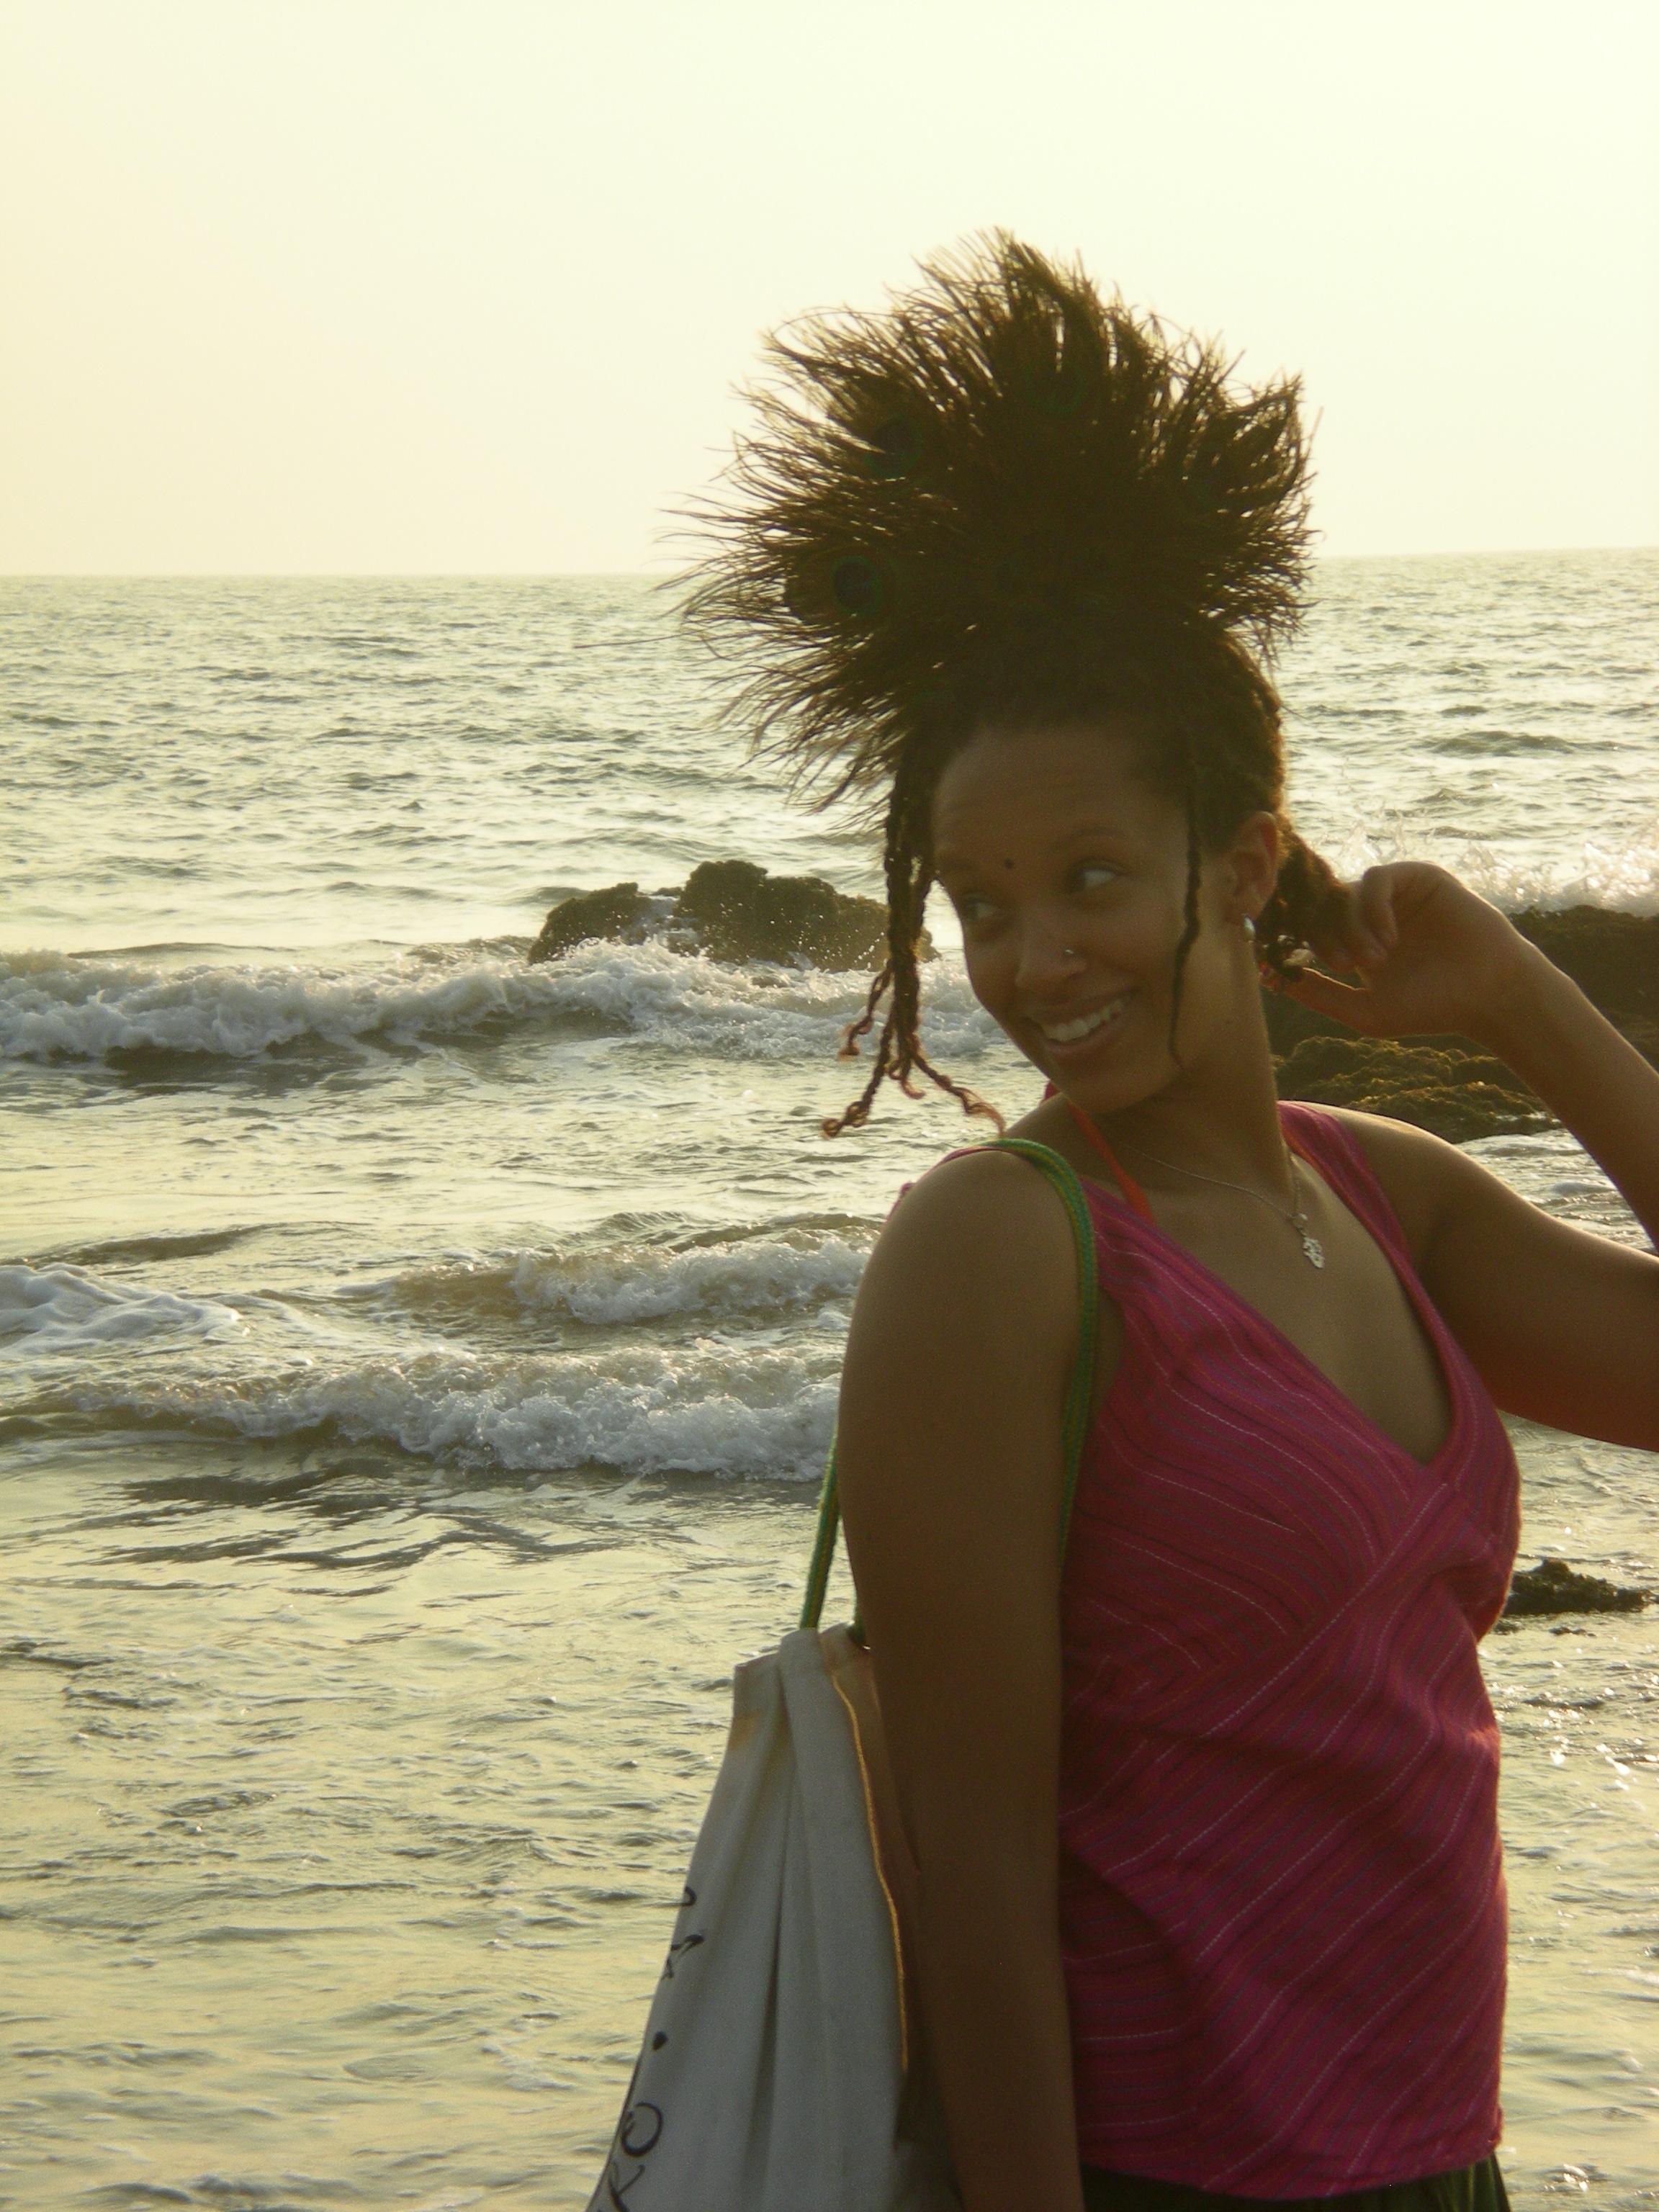 10 things about me ashtangi mami image